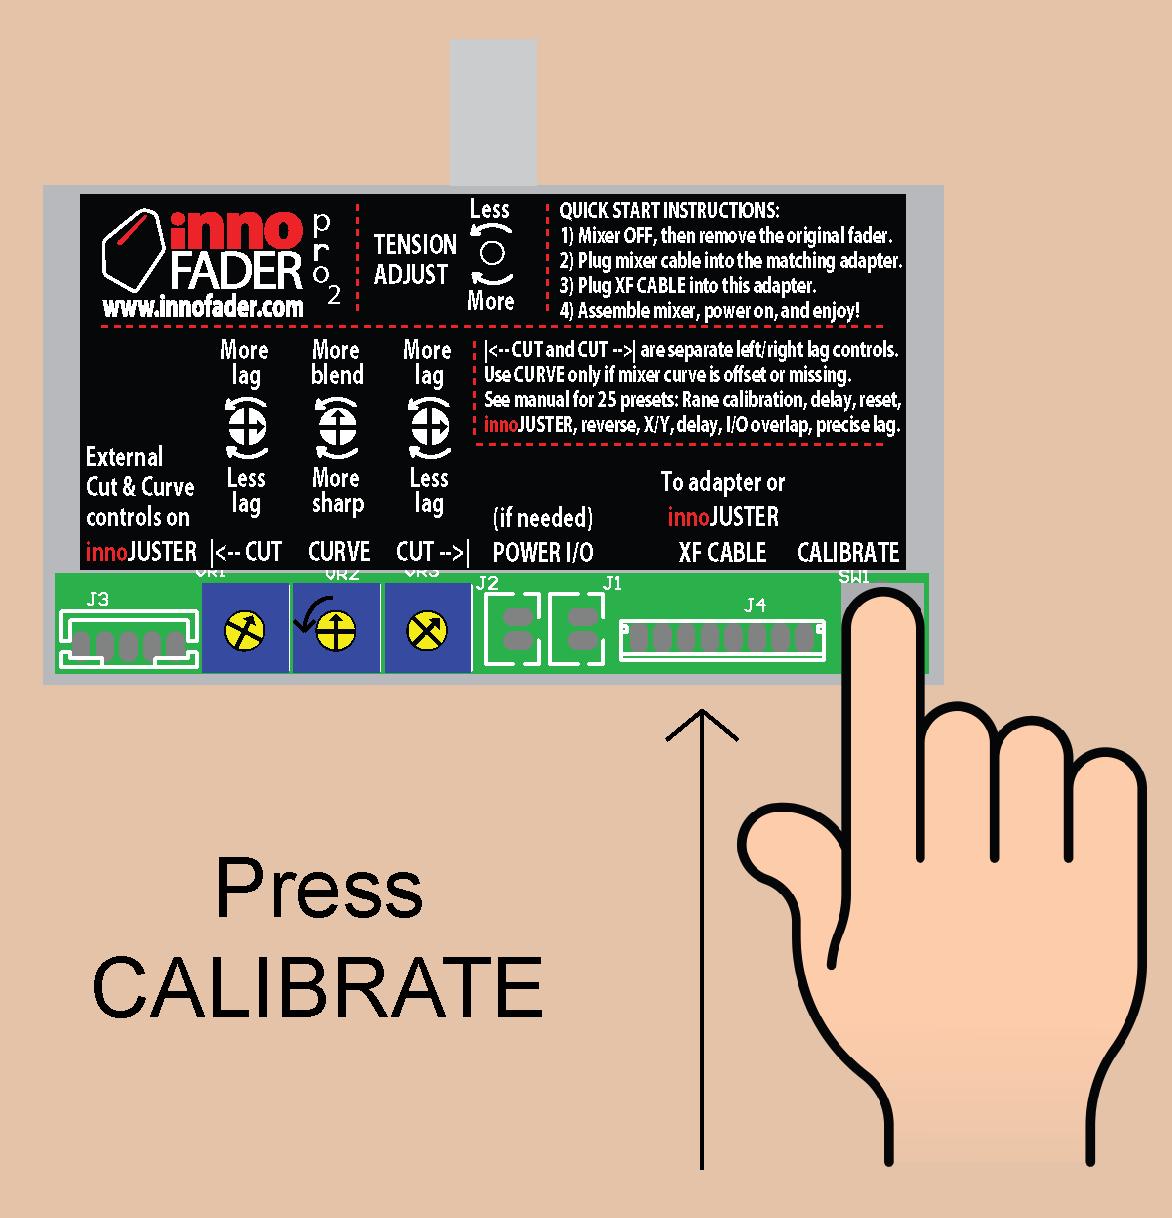 Calib10.png